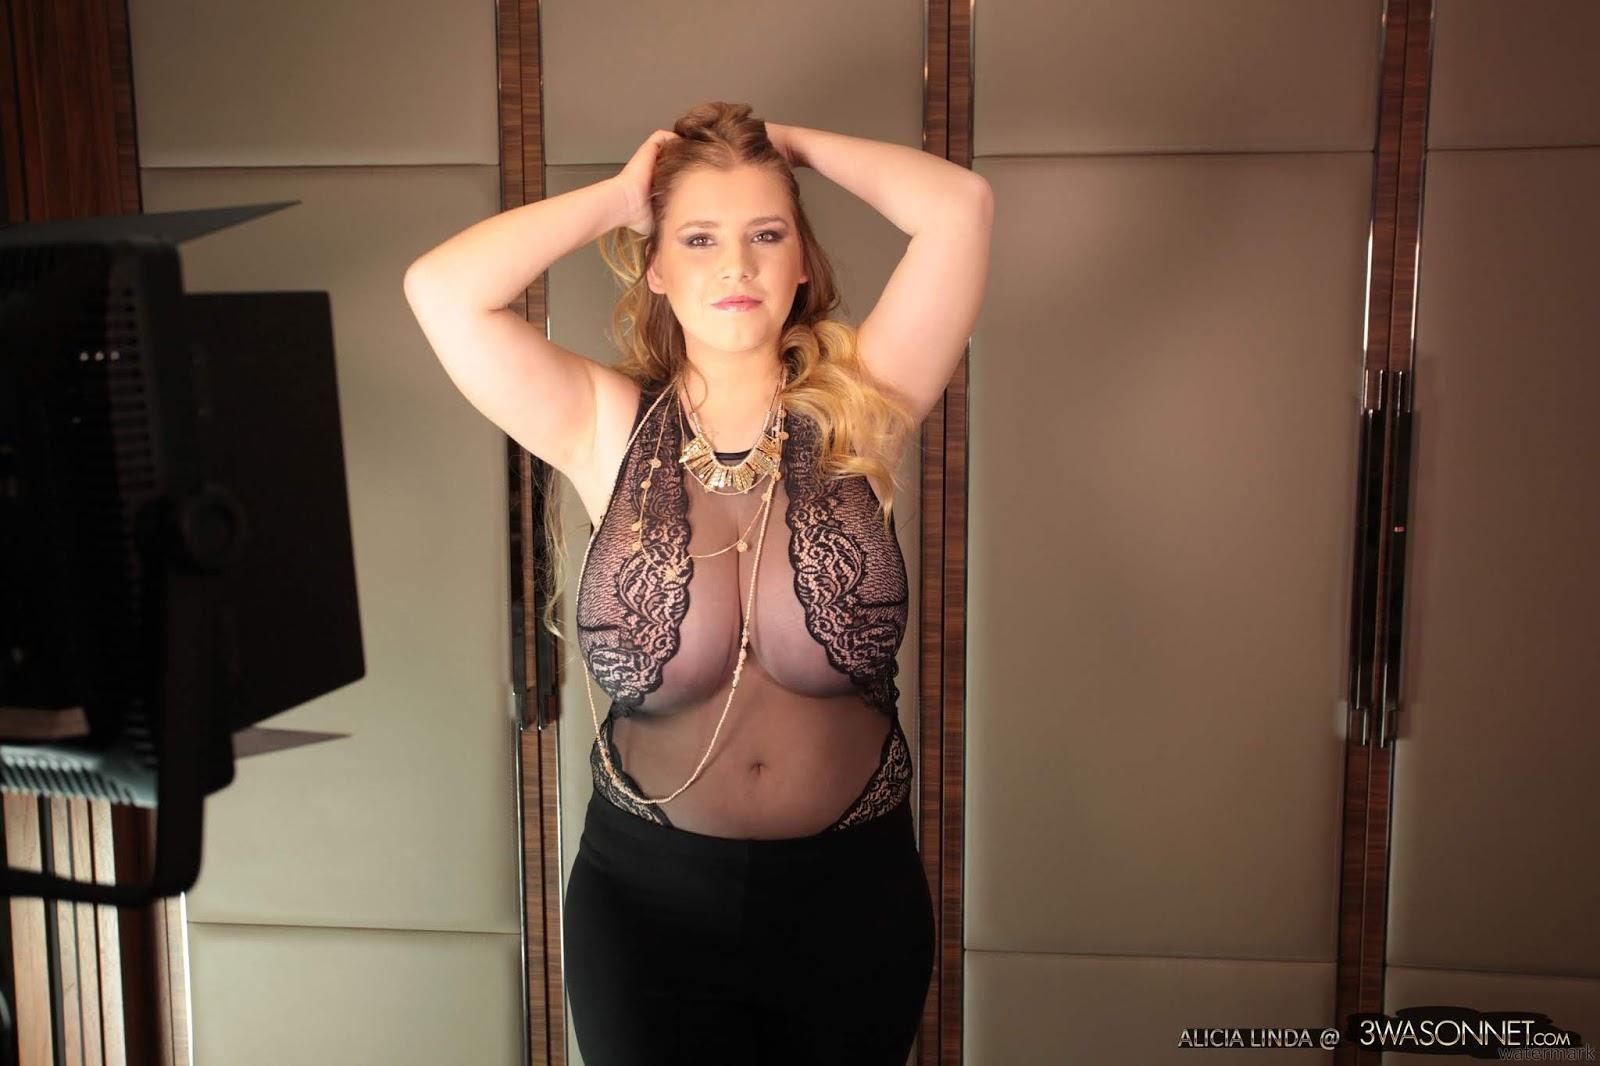 Linda on line boobs